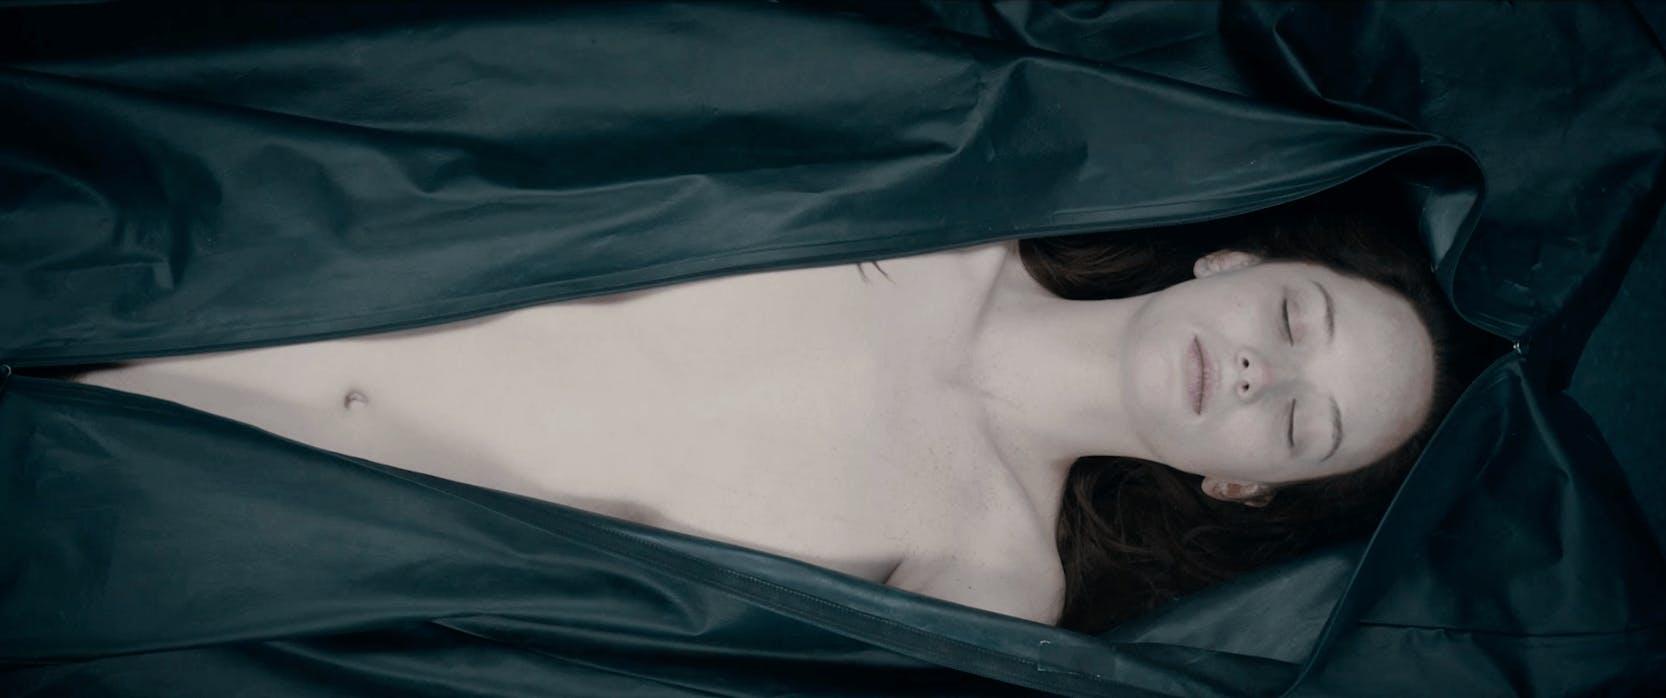 best halloween movies on netflix: autopsy of jane doe